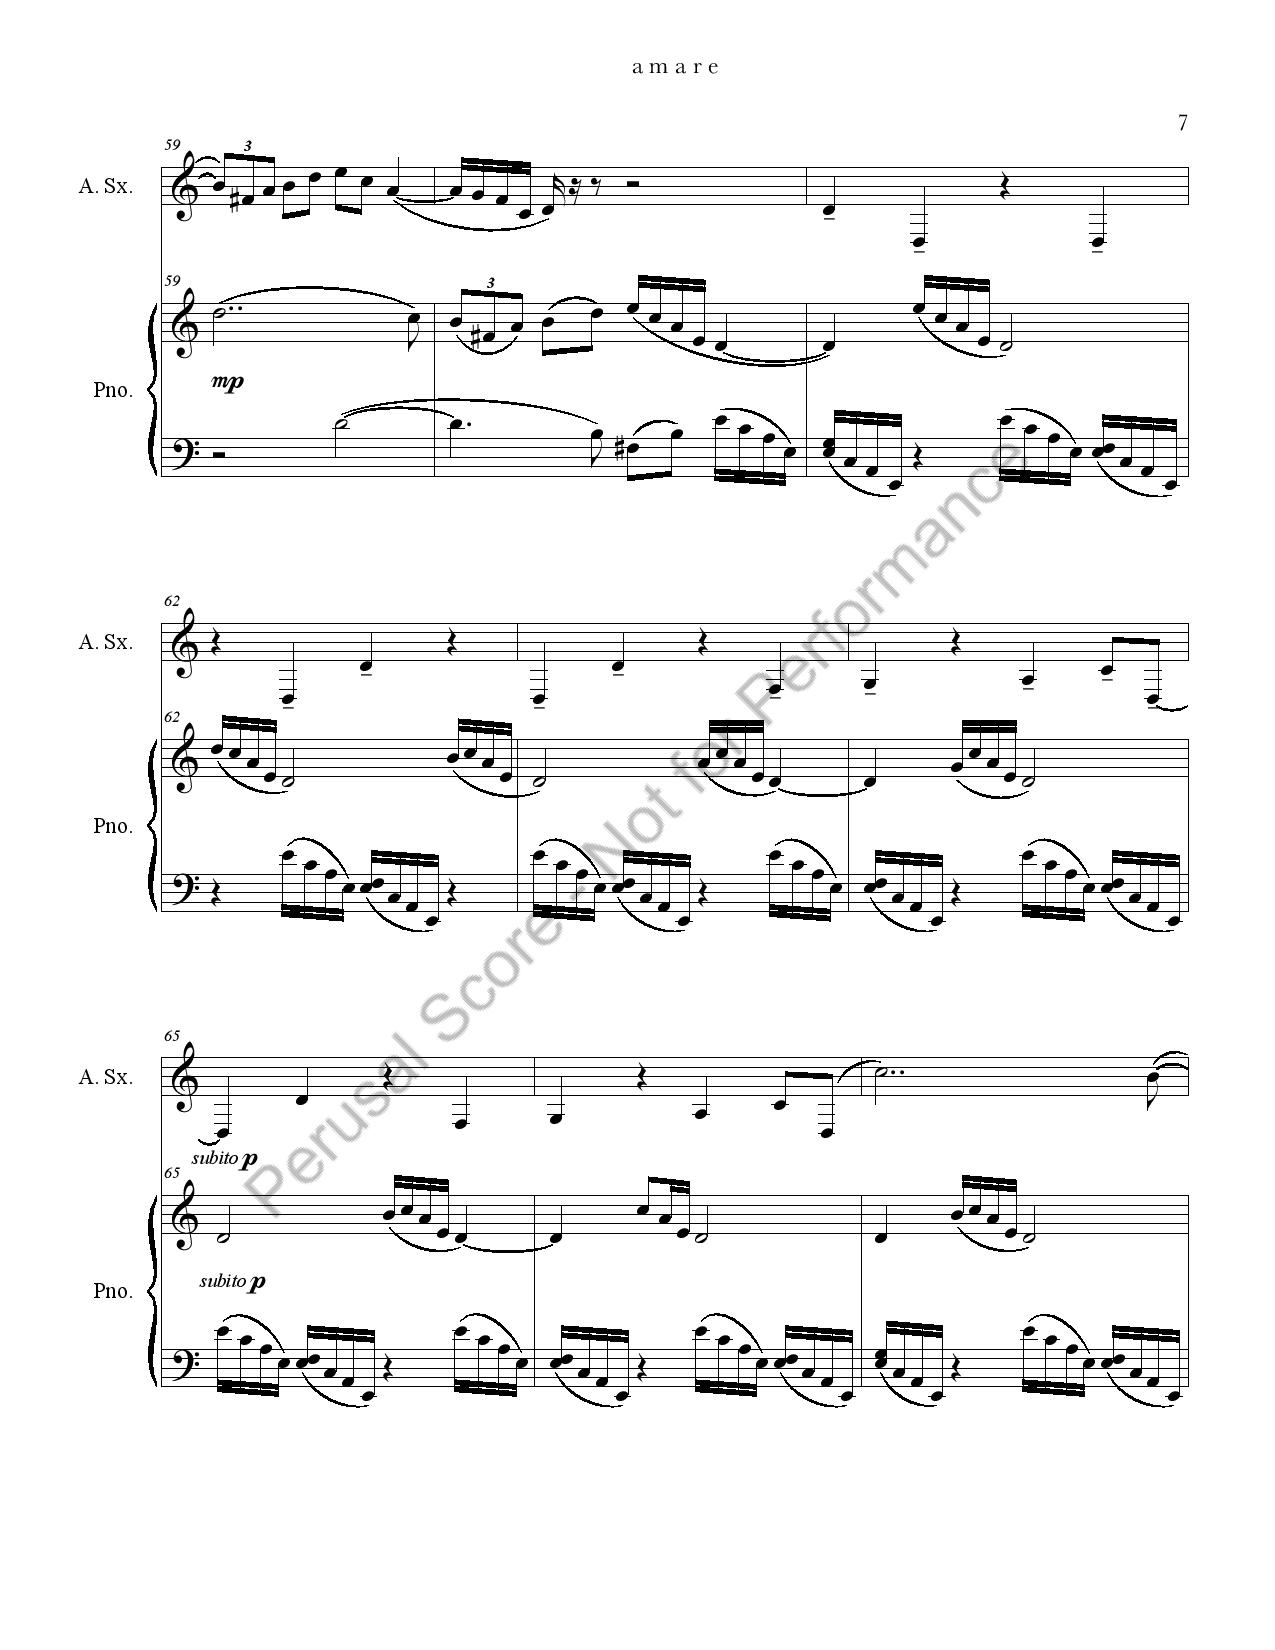 Boyd Amare Score_watermark-3-page-013.jpg